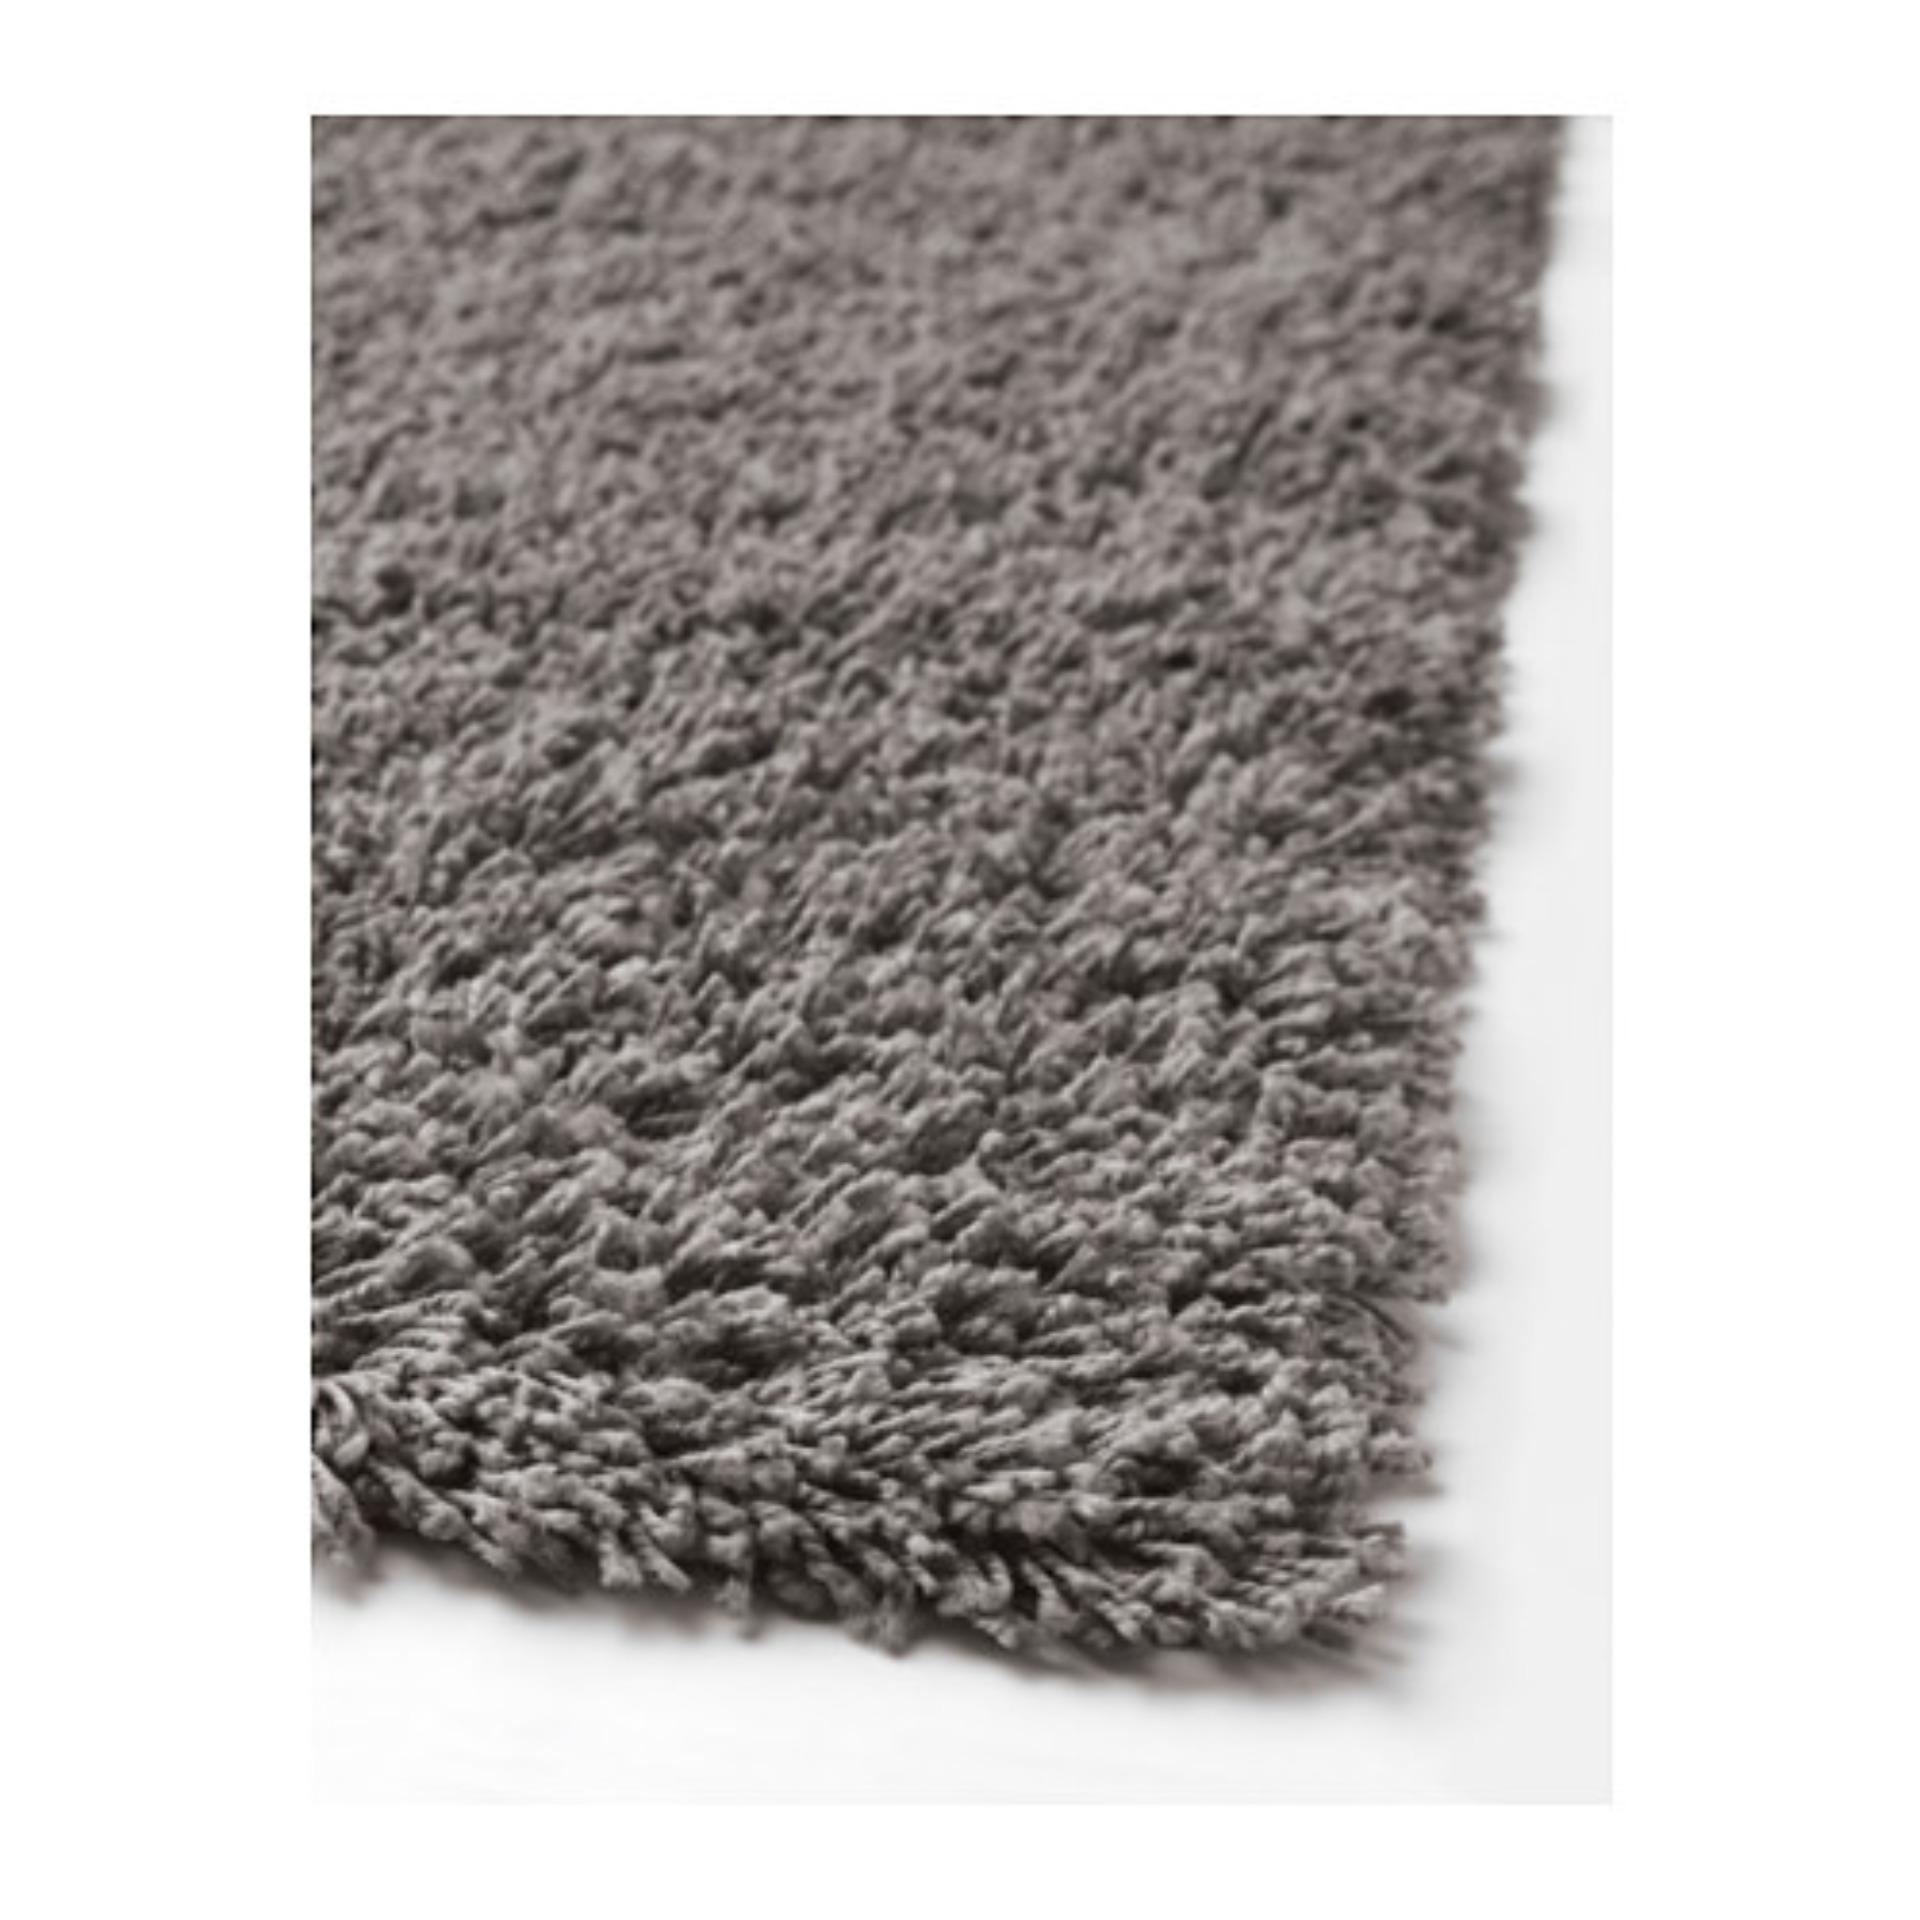 Karpet Bulu Berbulu Anti Selip Tikar Karpet Permadani Yang